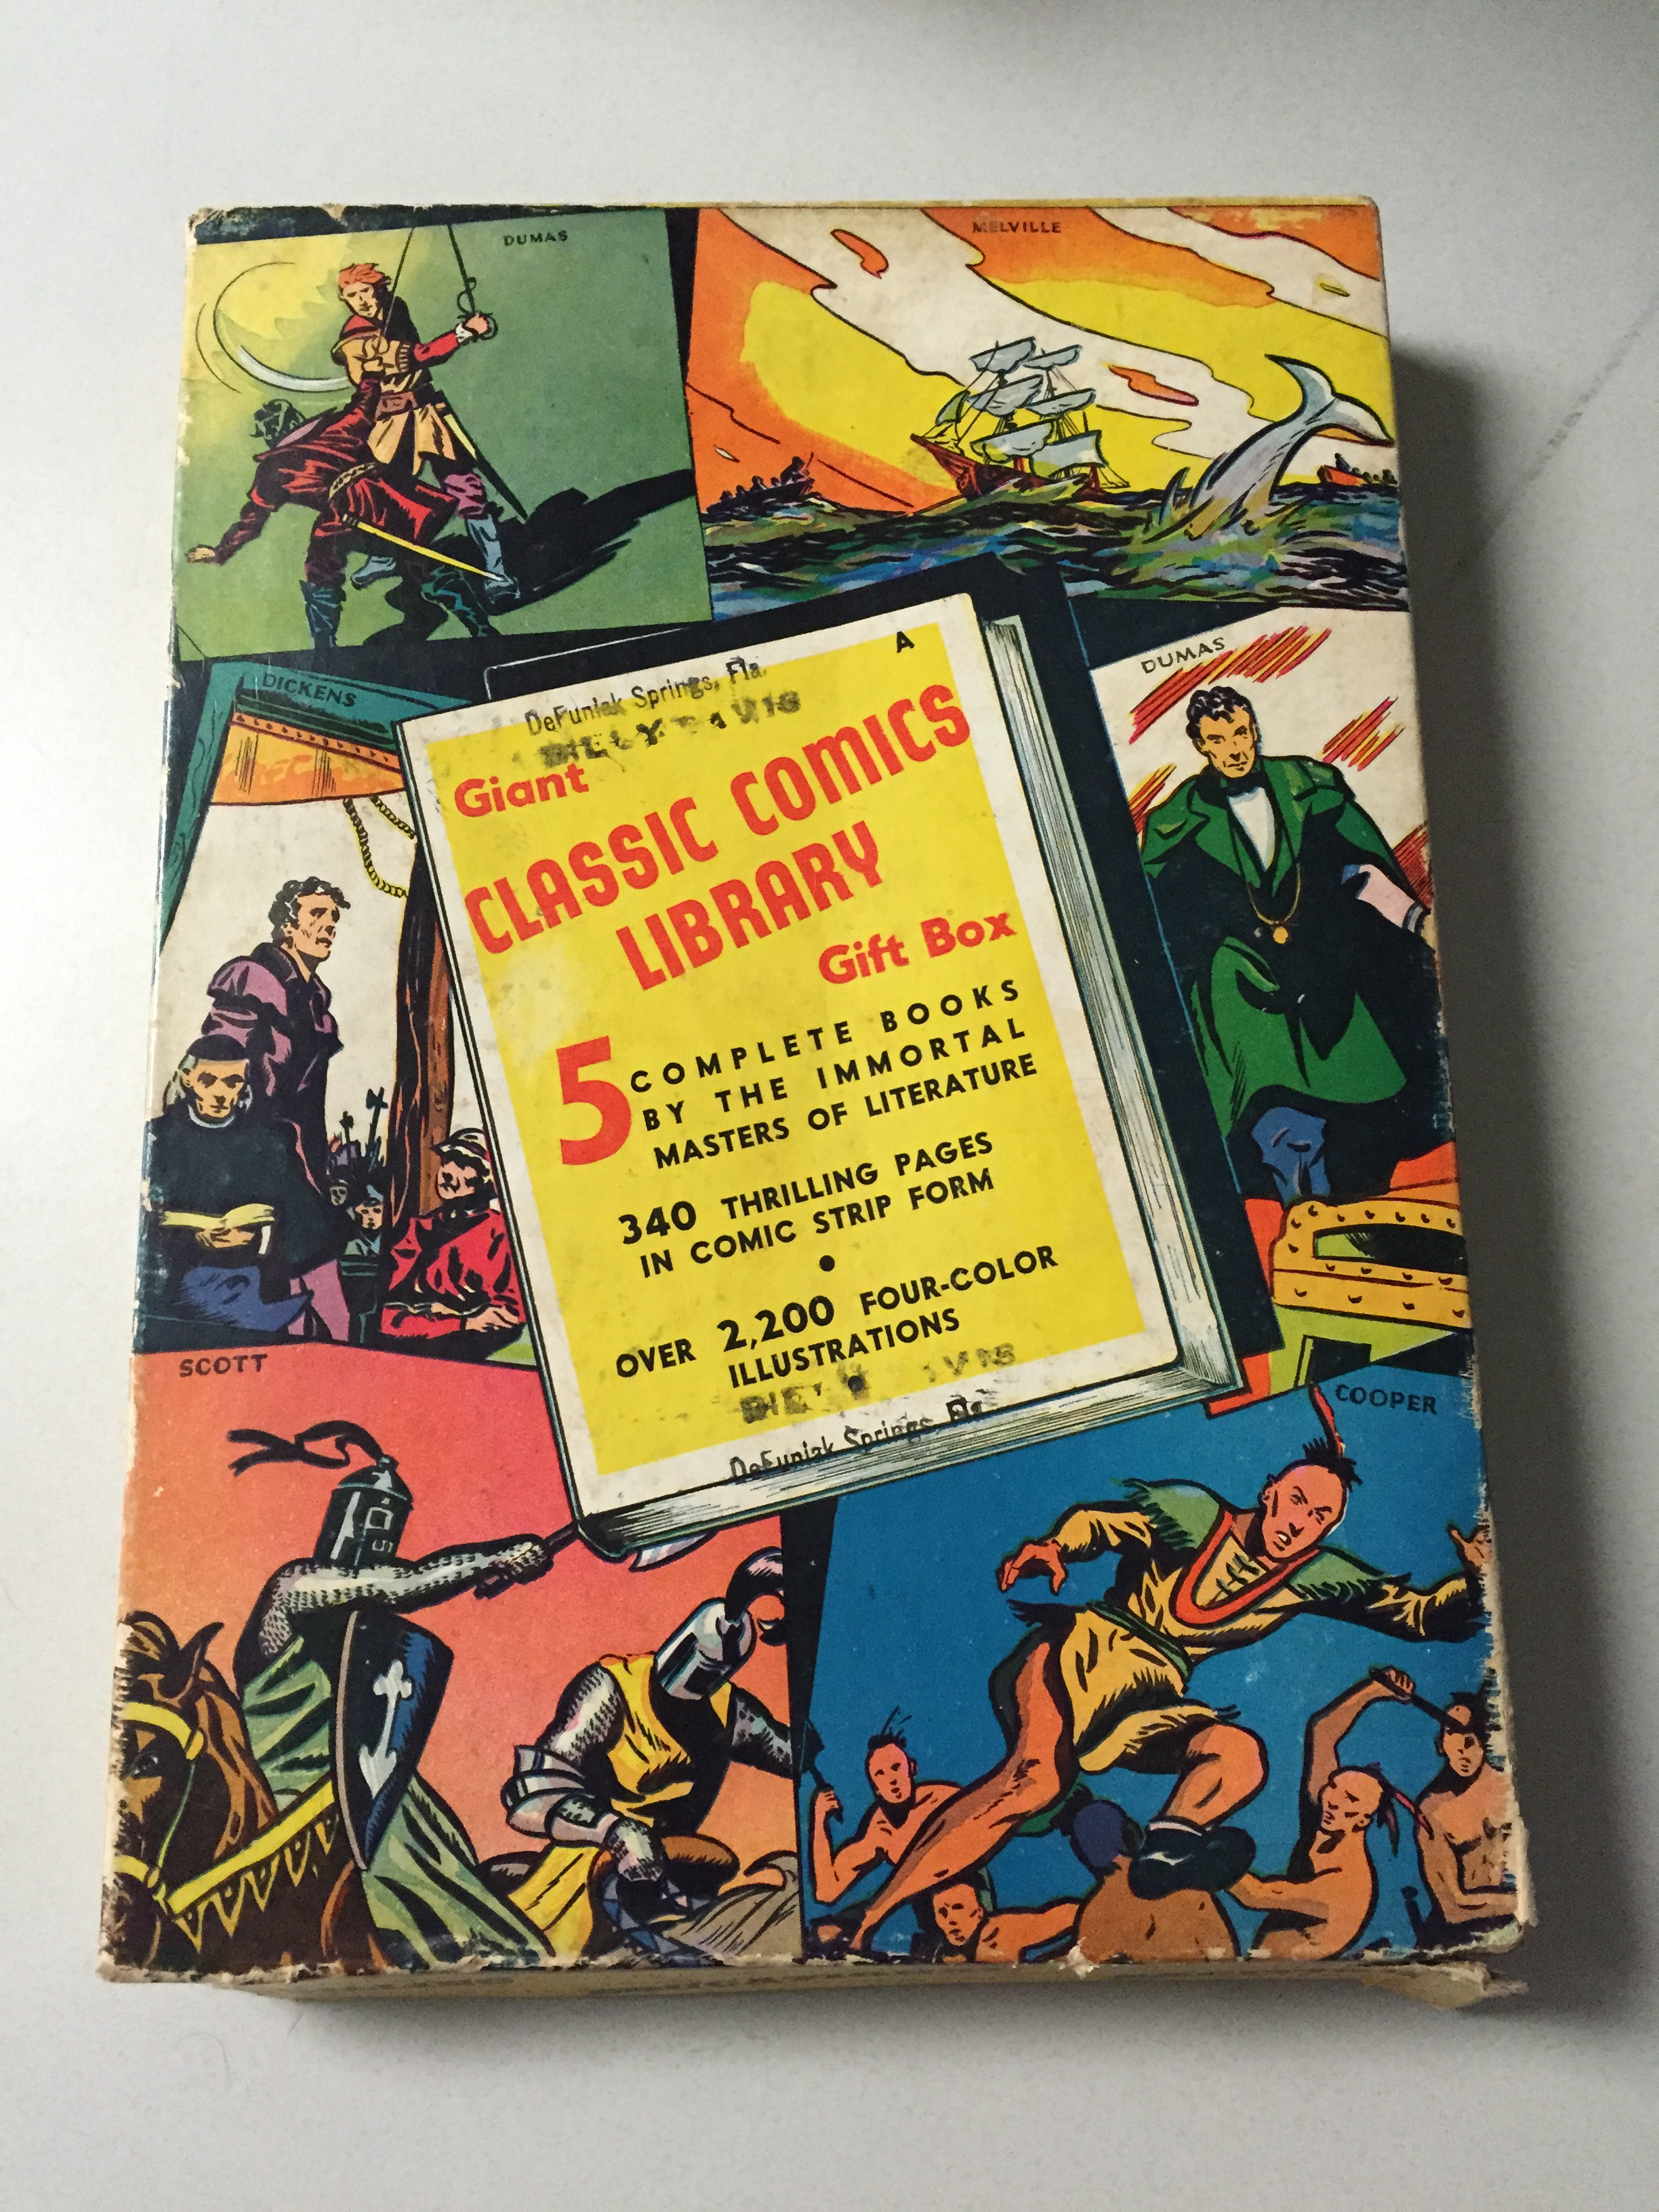 Classic Comics Library Gift Box